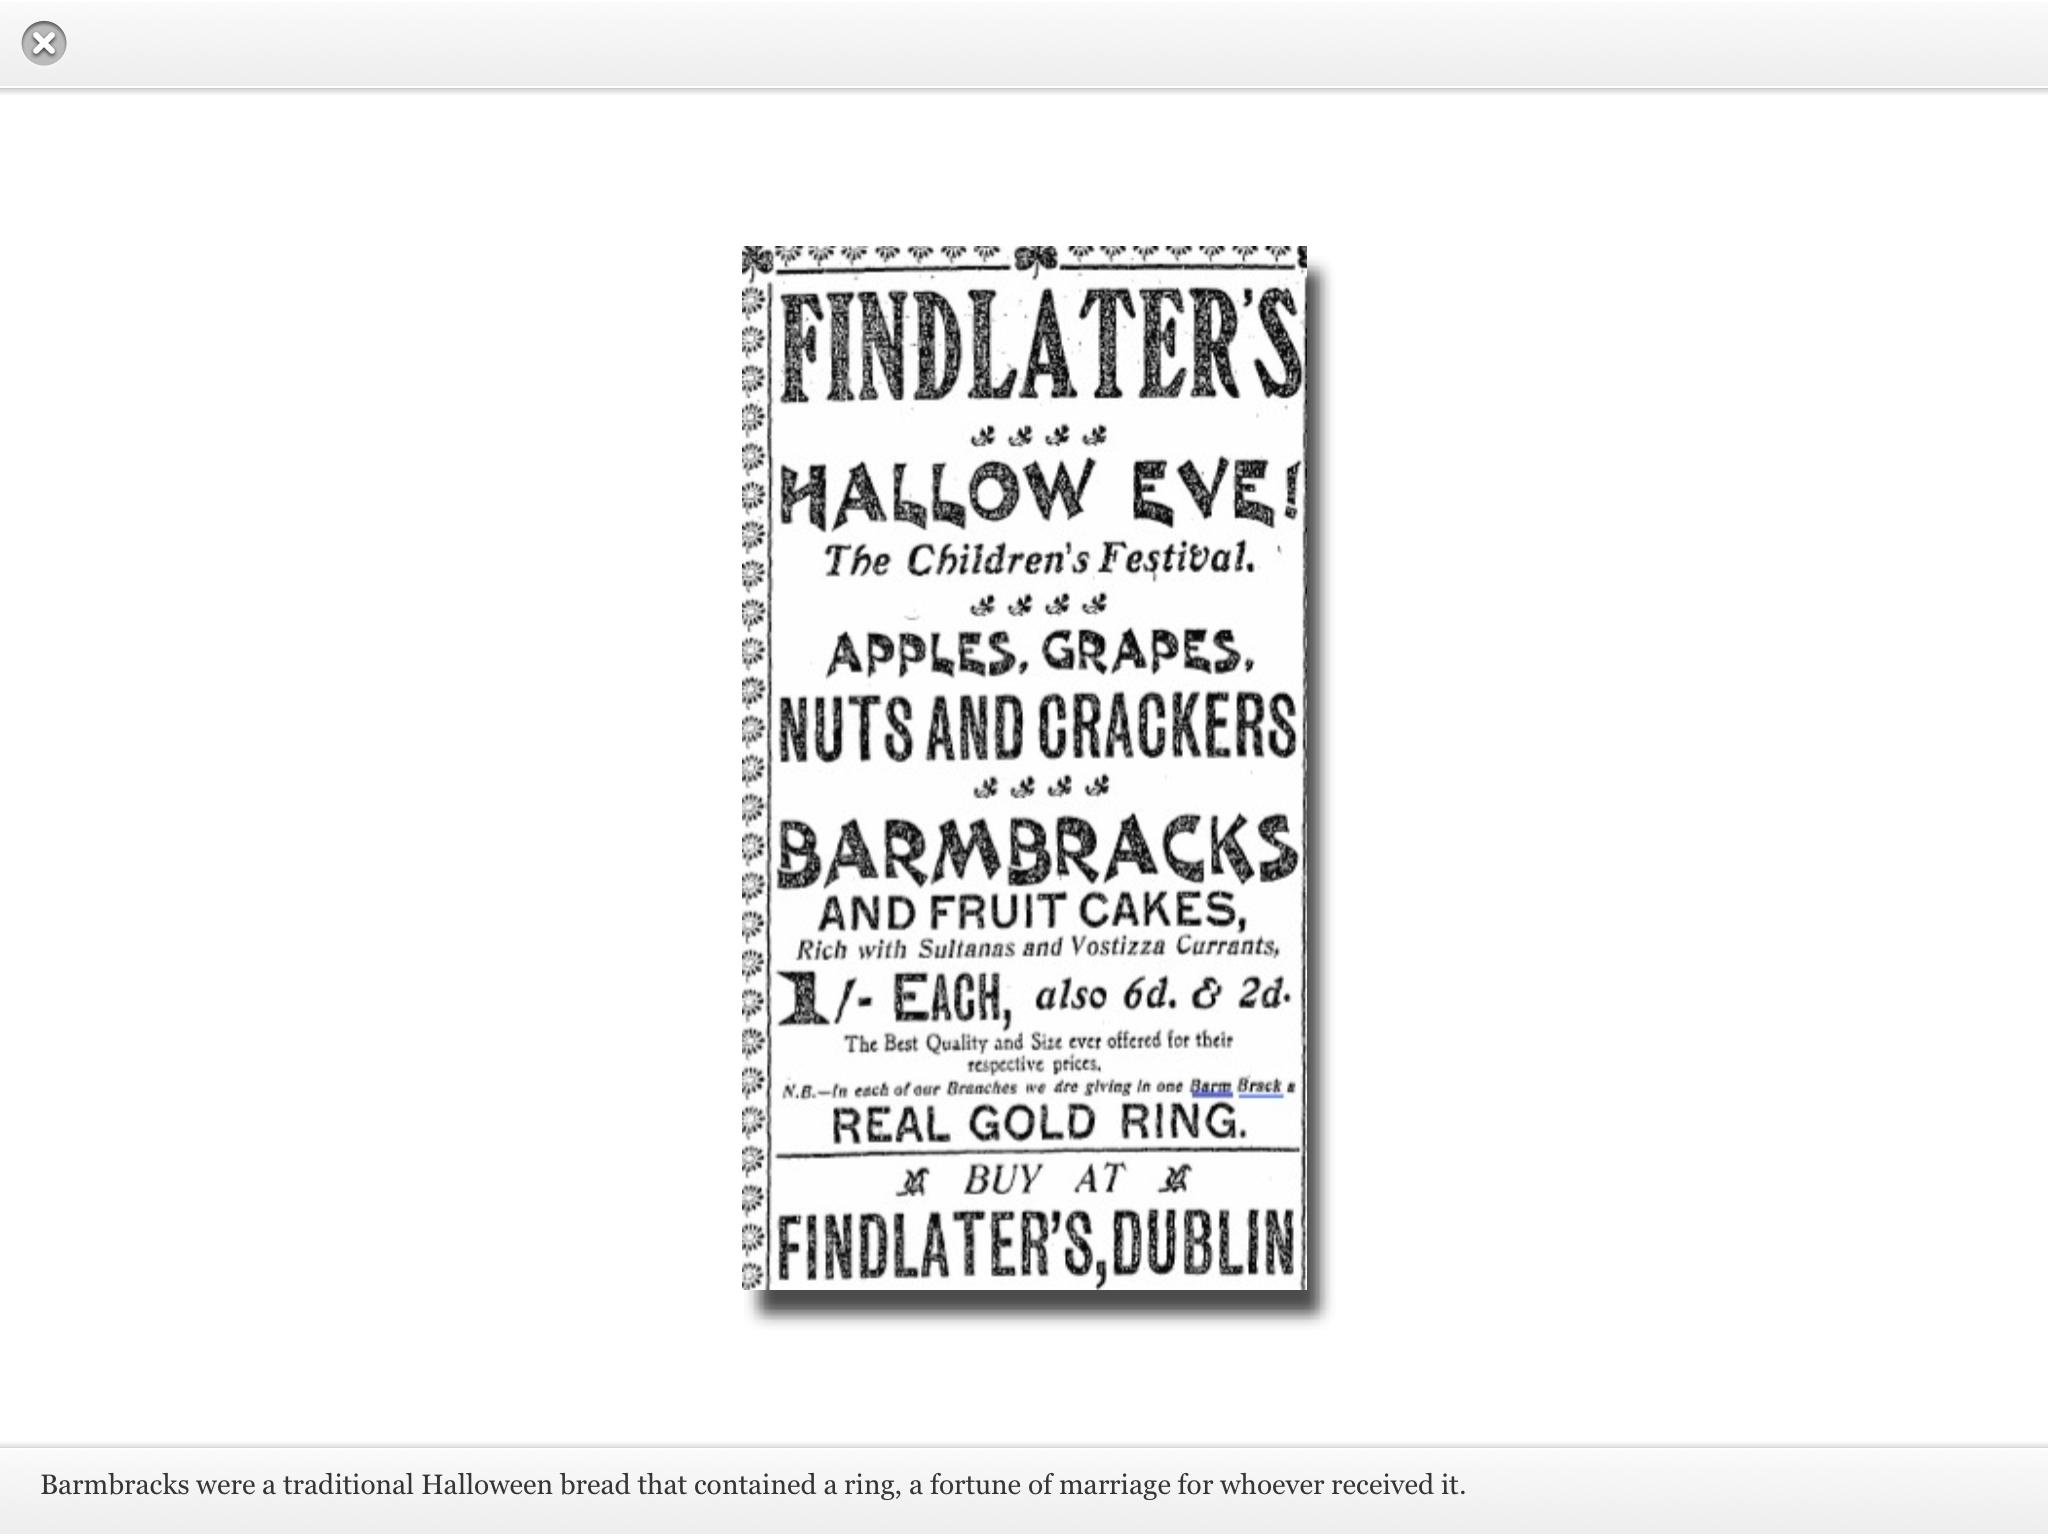 critical essays dubliners Label twentieth century interpretations of dubliners : a collection of critical essays, edited by peter k garrett --publication englewood cliffs, nj, prentice-hall, 1968.